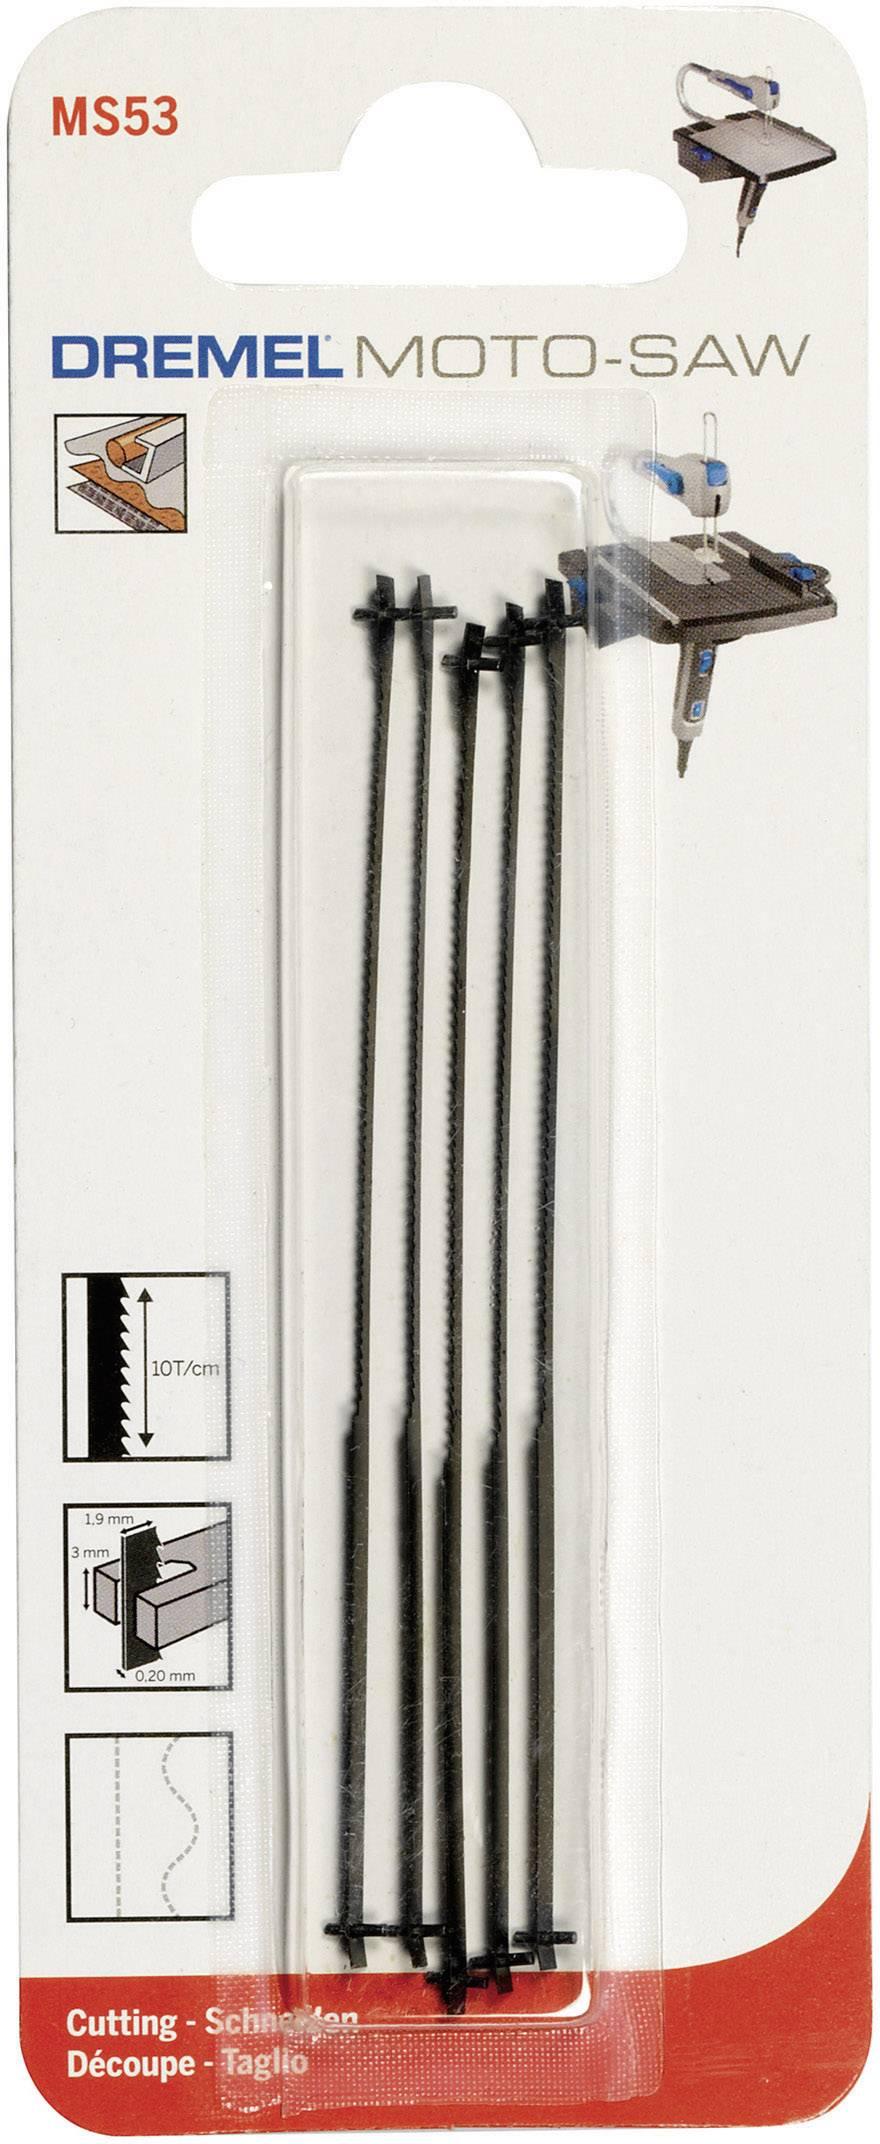 Pilový list Dremel MS53 Moto-Saw, 100 mm, 5 ks